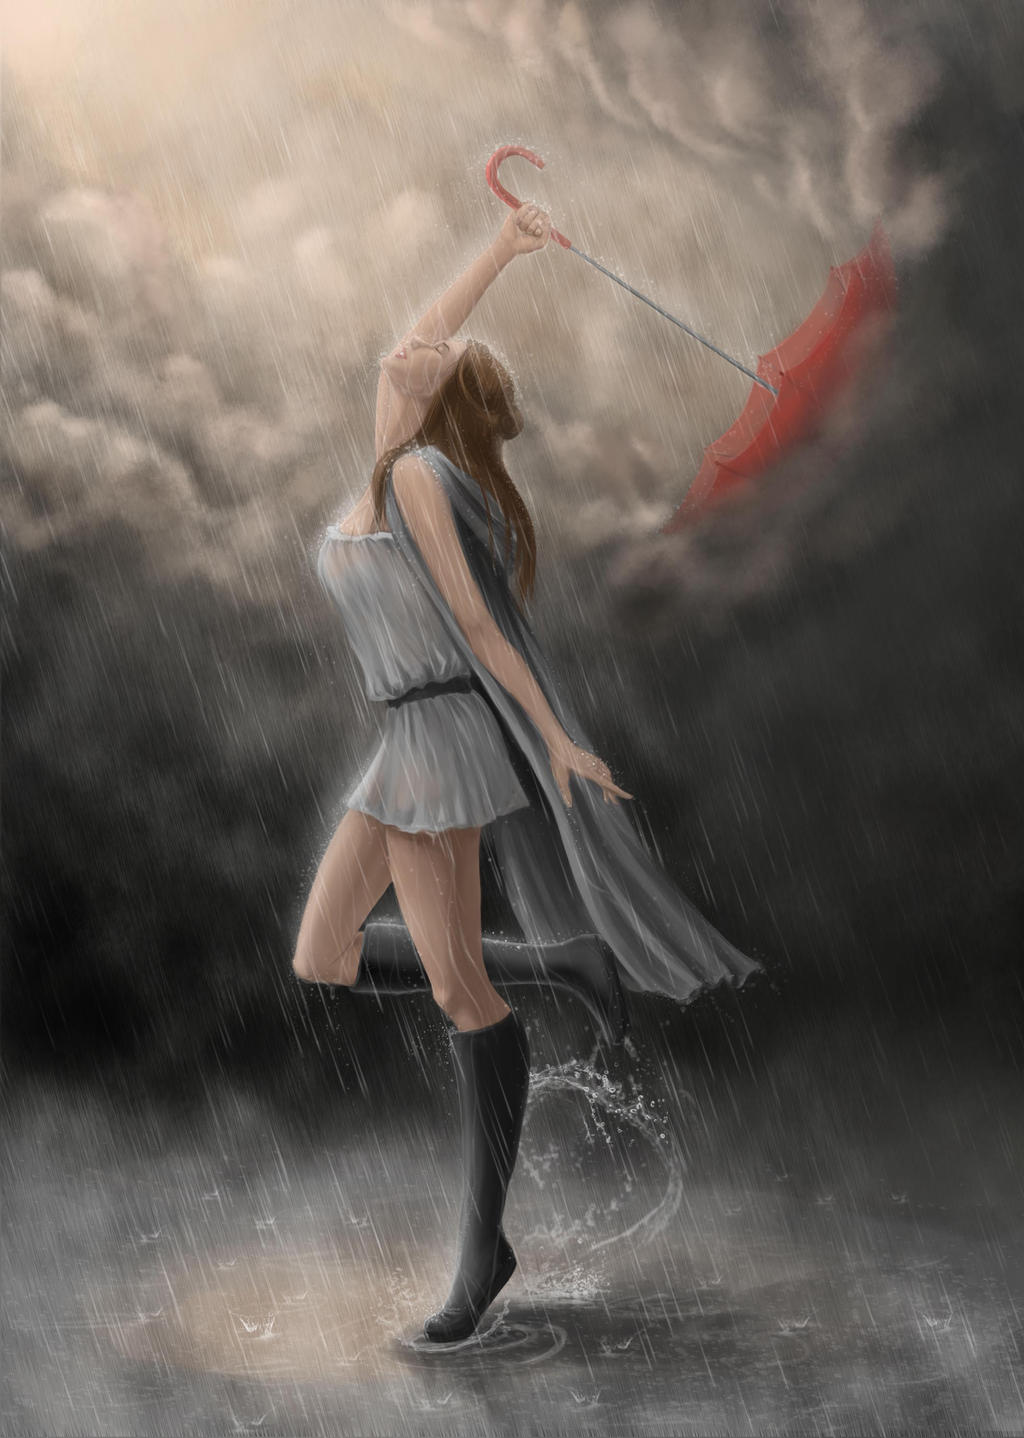 Happy Girl Dancing In The Rain 90510 Movieweb